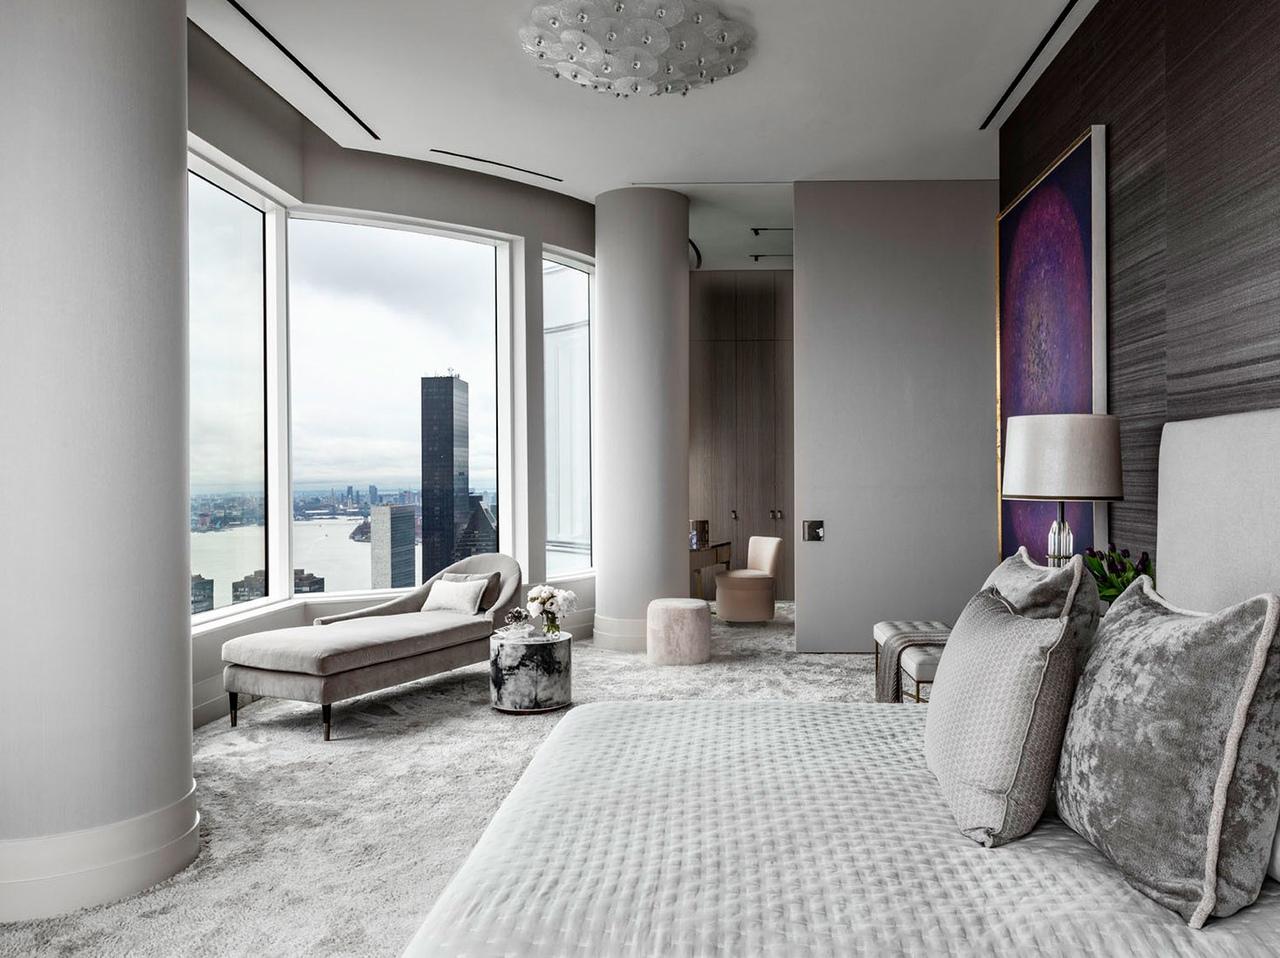 Квартира на 60-м этаже по дизайну Дэвида Скотта || 01